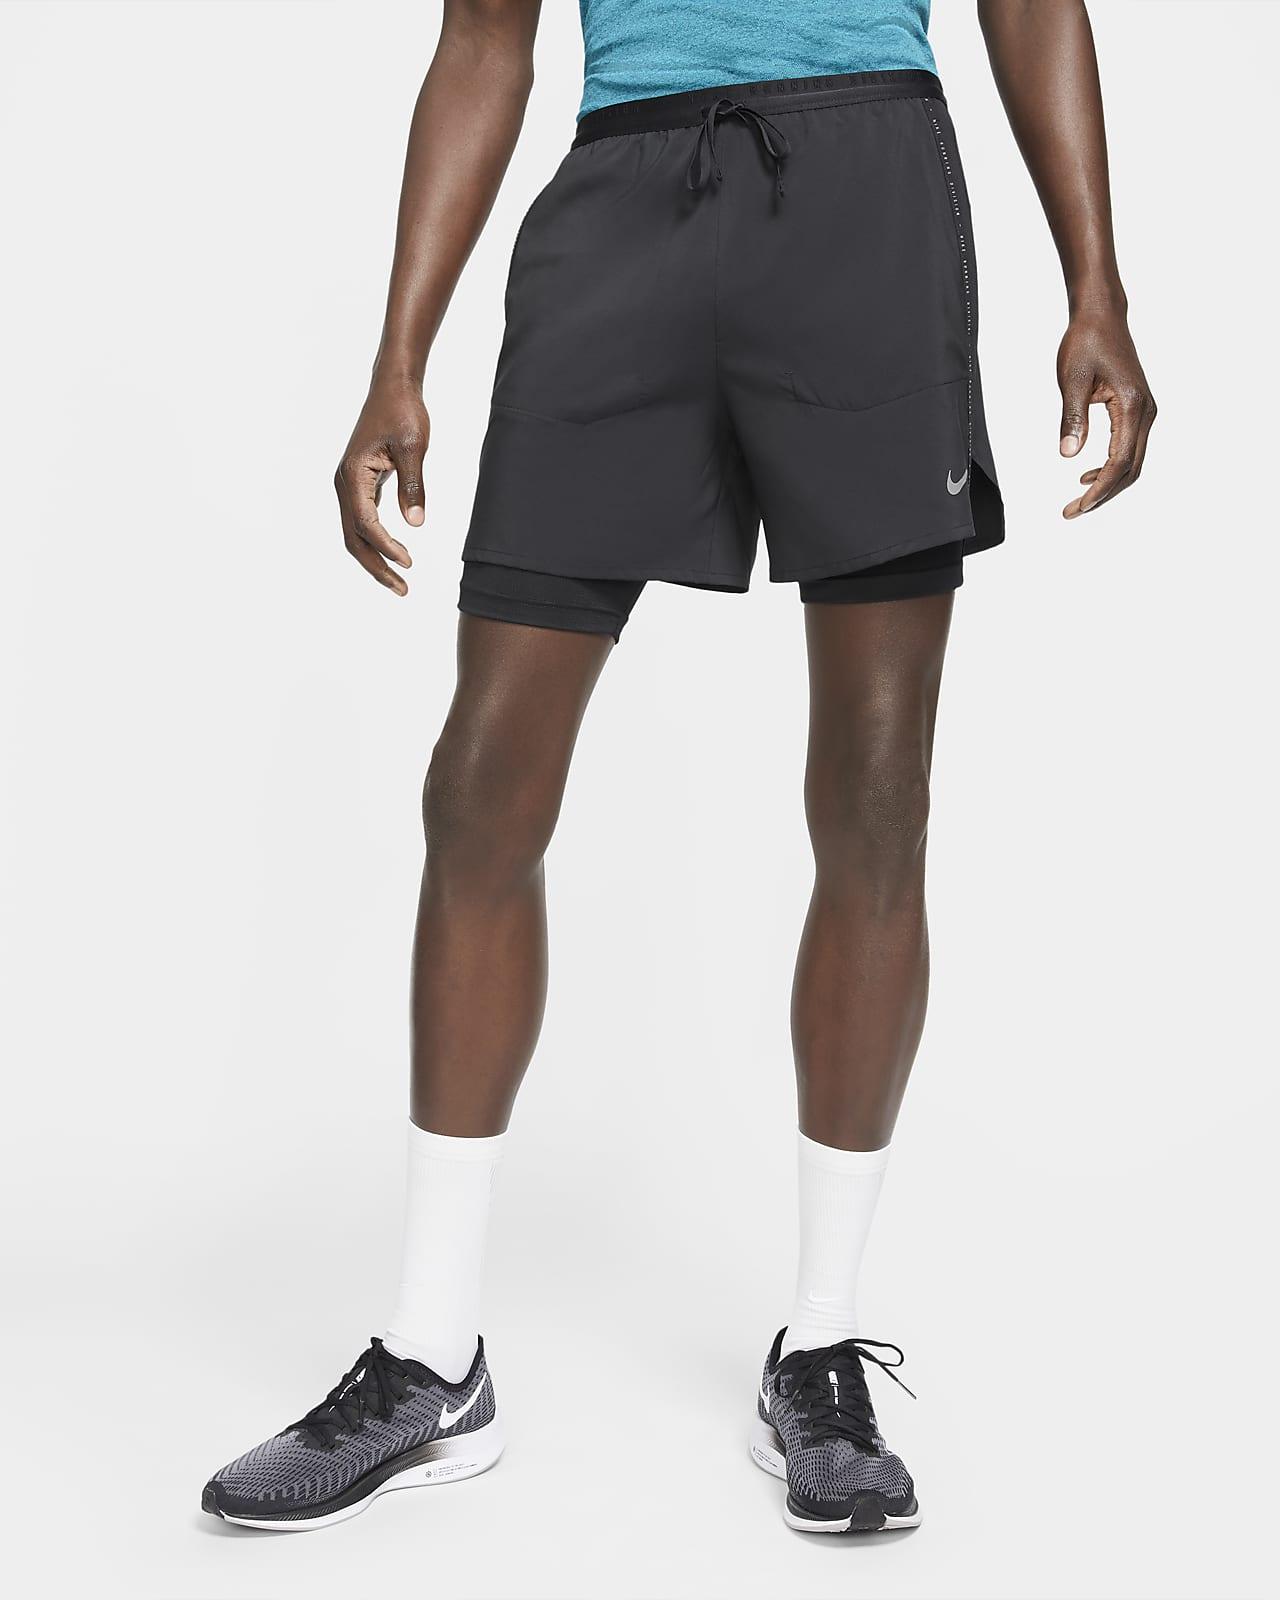 Short de running hybride Nike Flex Stride Run Division pour Homme